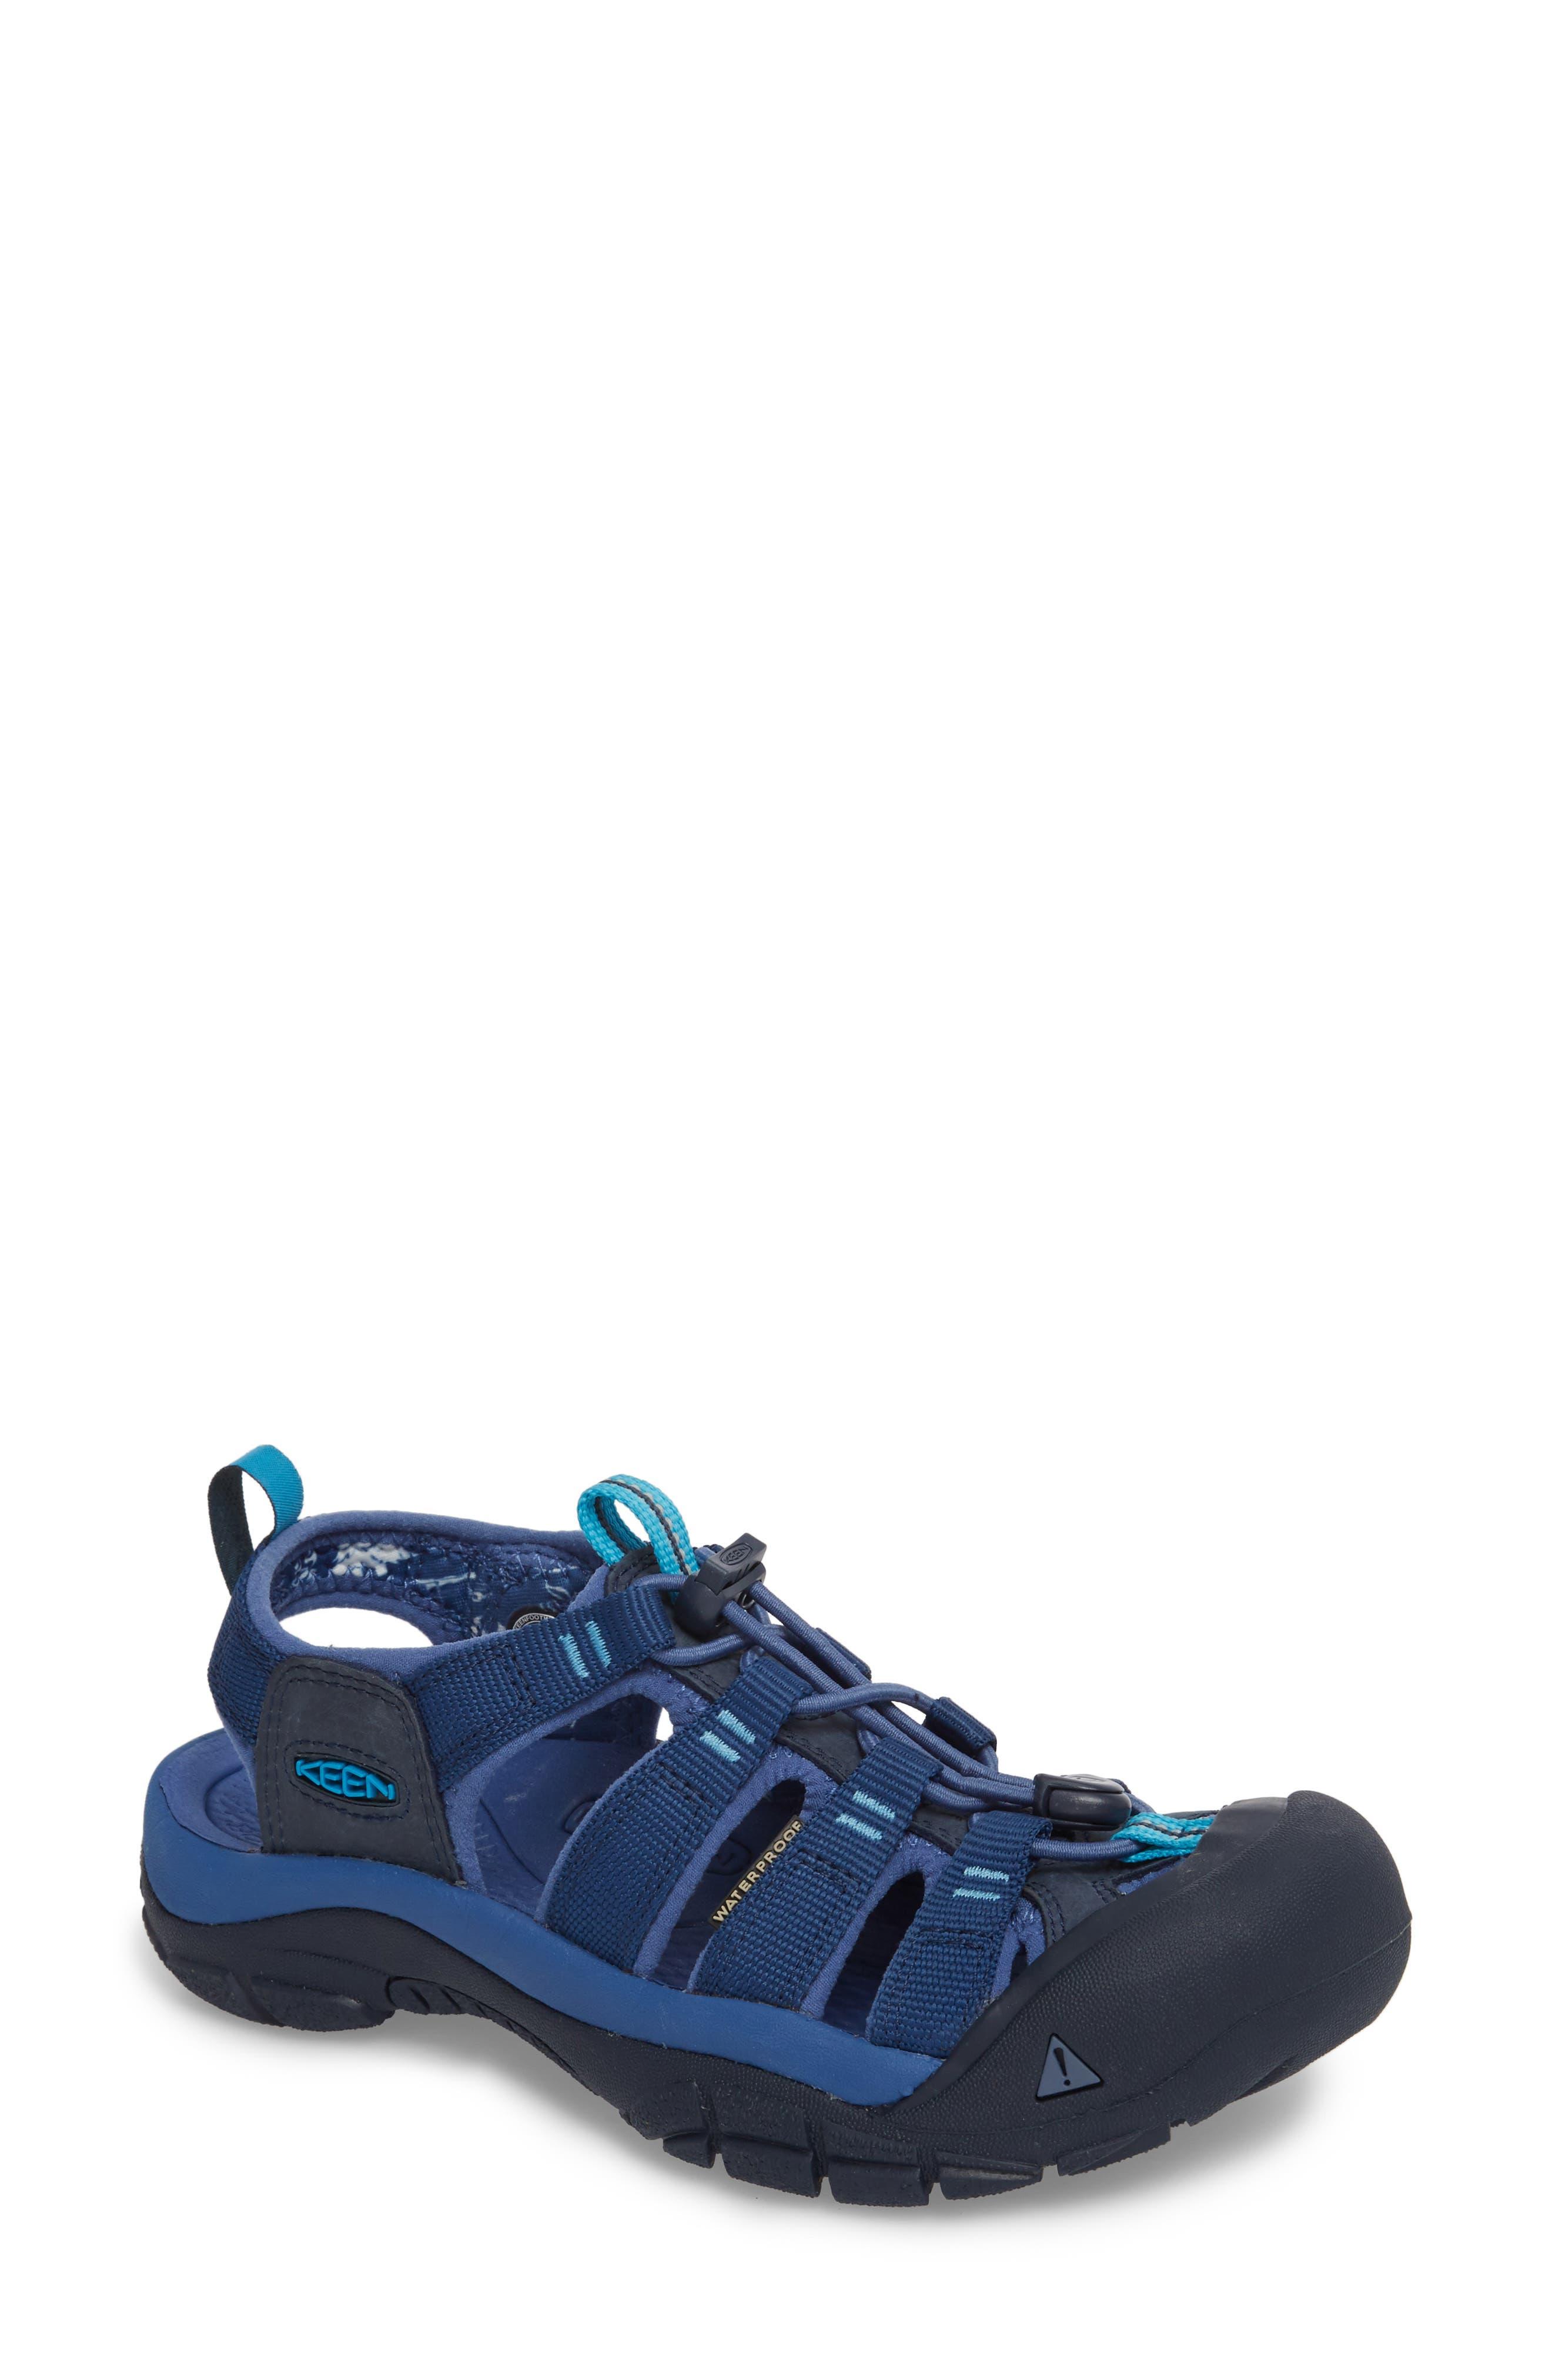 Alternate Image 1 Selected - Keen Newport Eco Waterproof Sandal (Women)